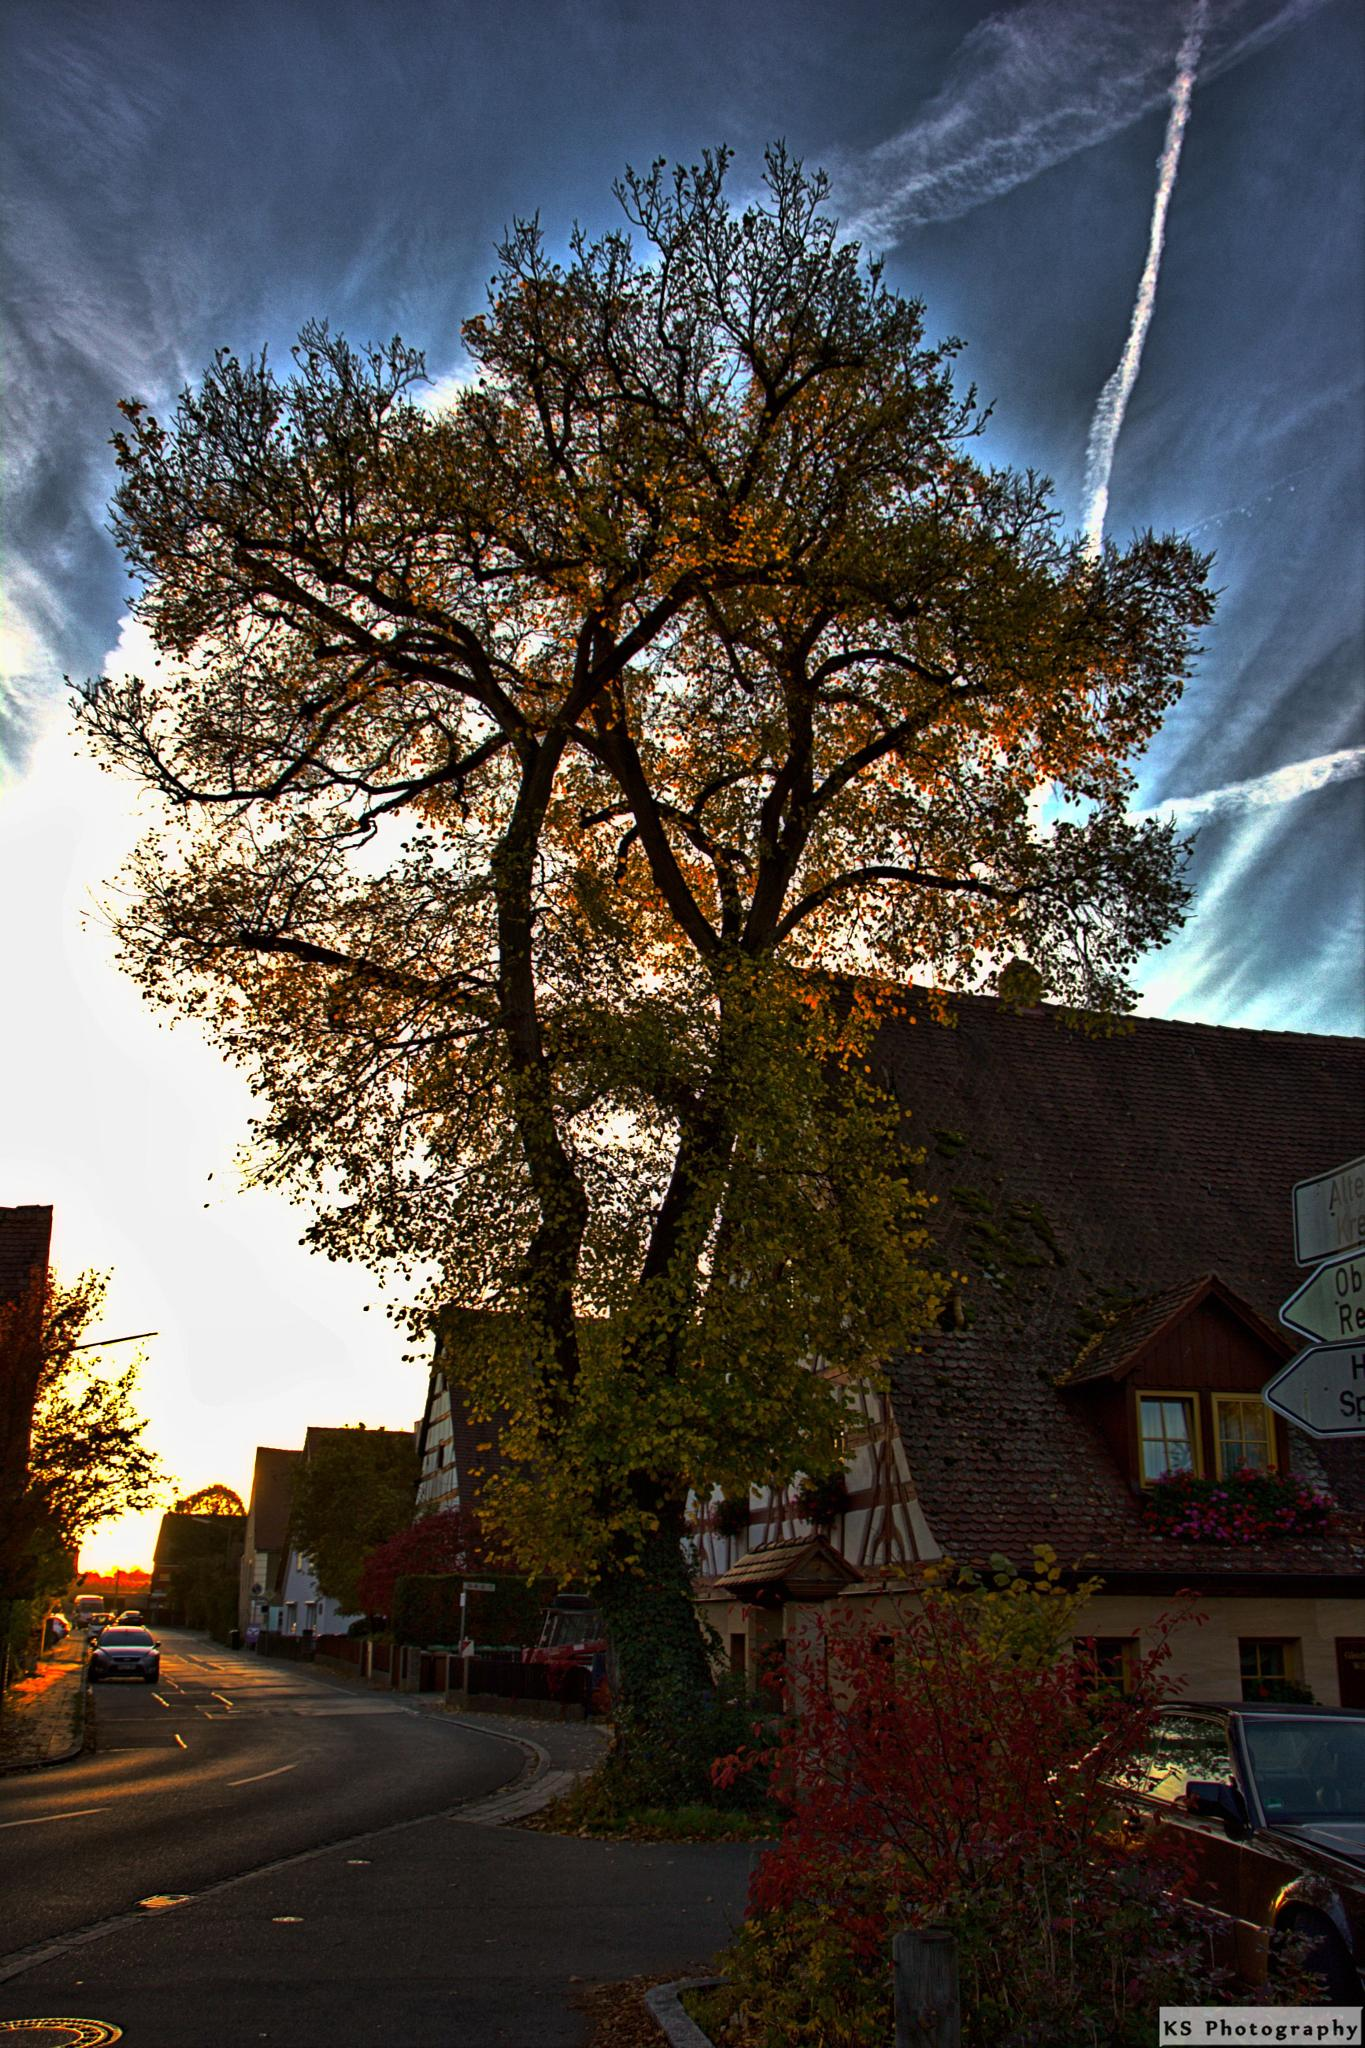 Old Franconian village by Klaus Schenker